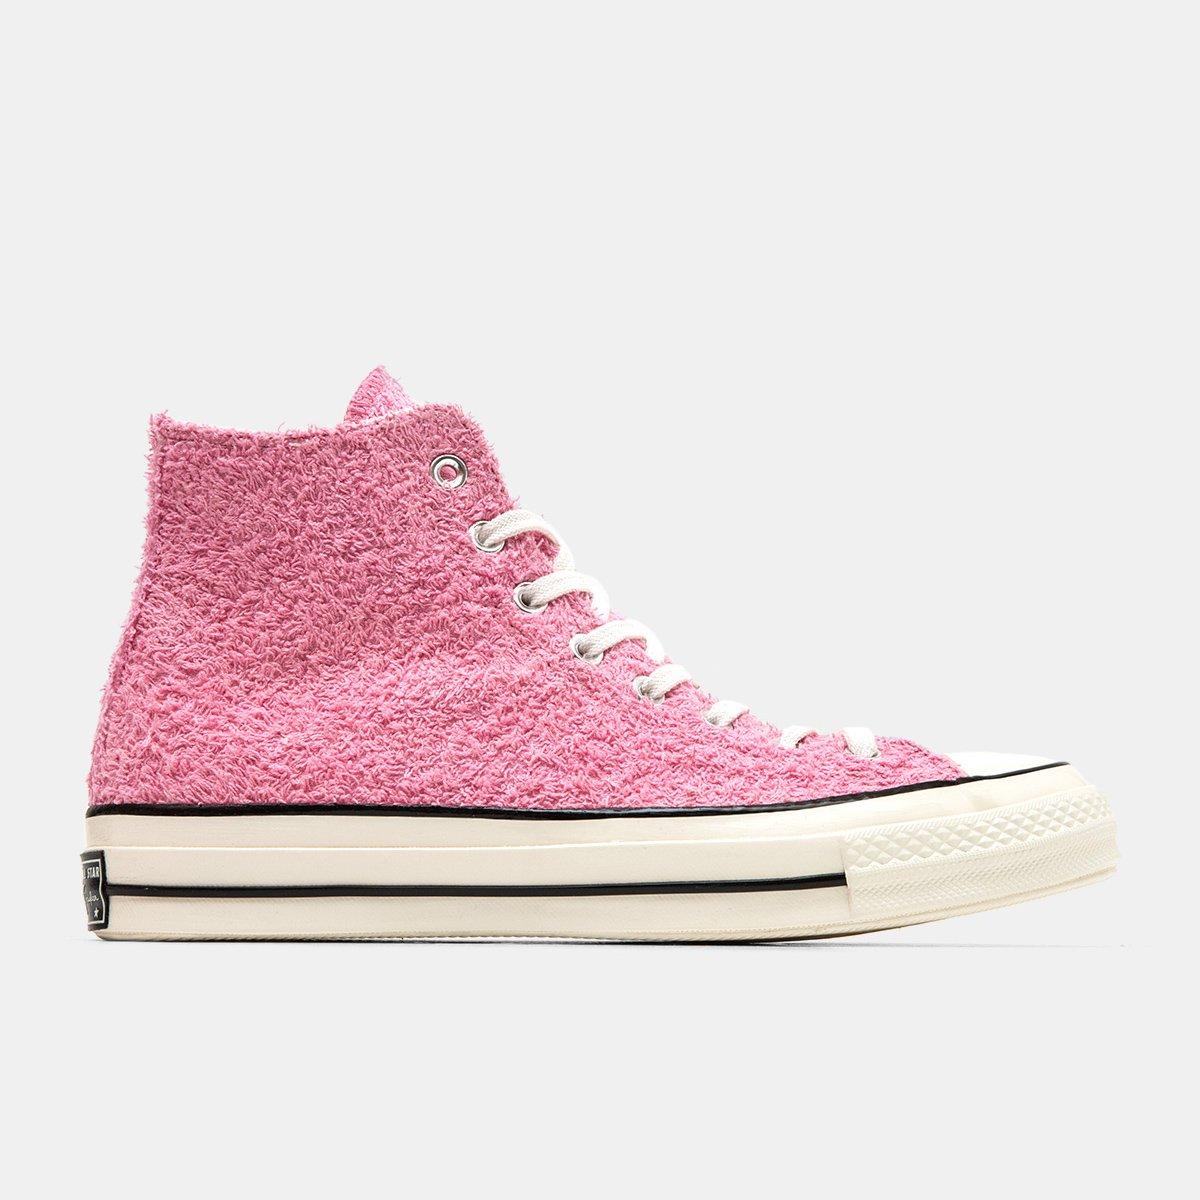 d0dcf9004343 ... Nike Converse Chuck Taylor All Star 70 Fuzzy Bunny 826 AM - 28 Apr 2017  ...